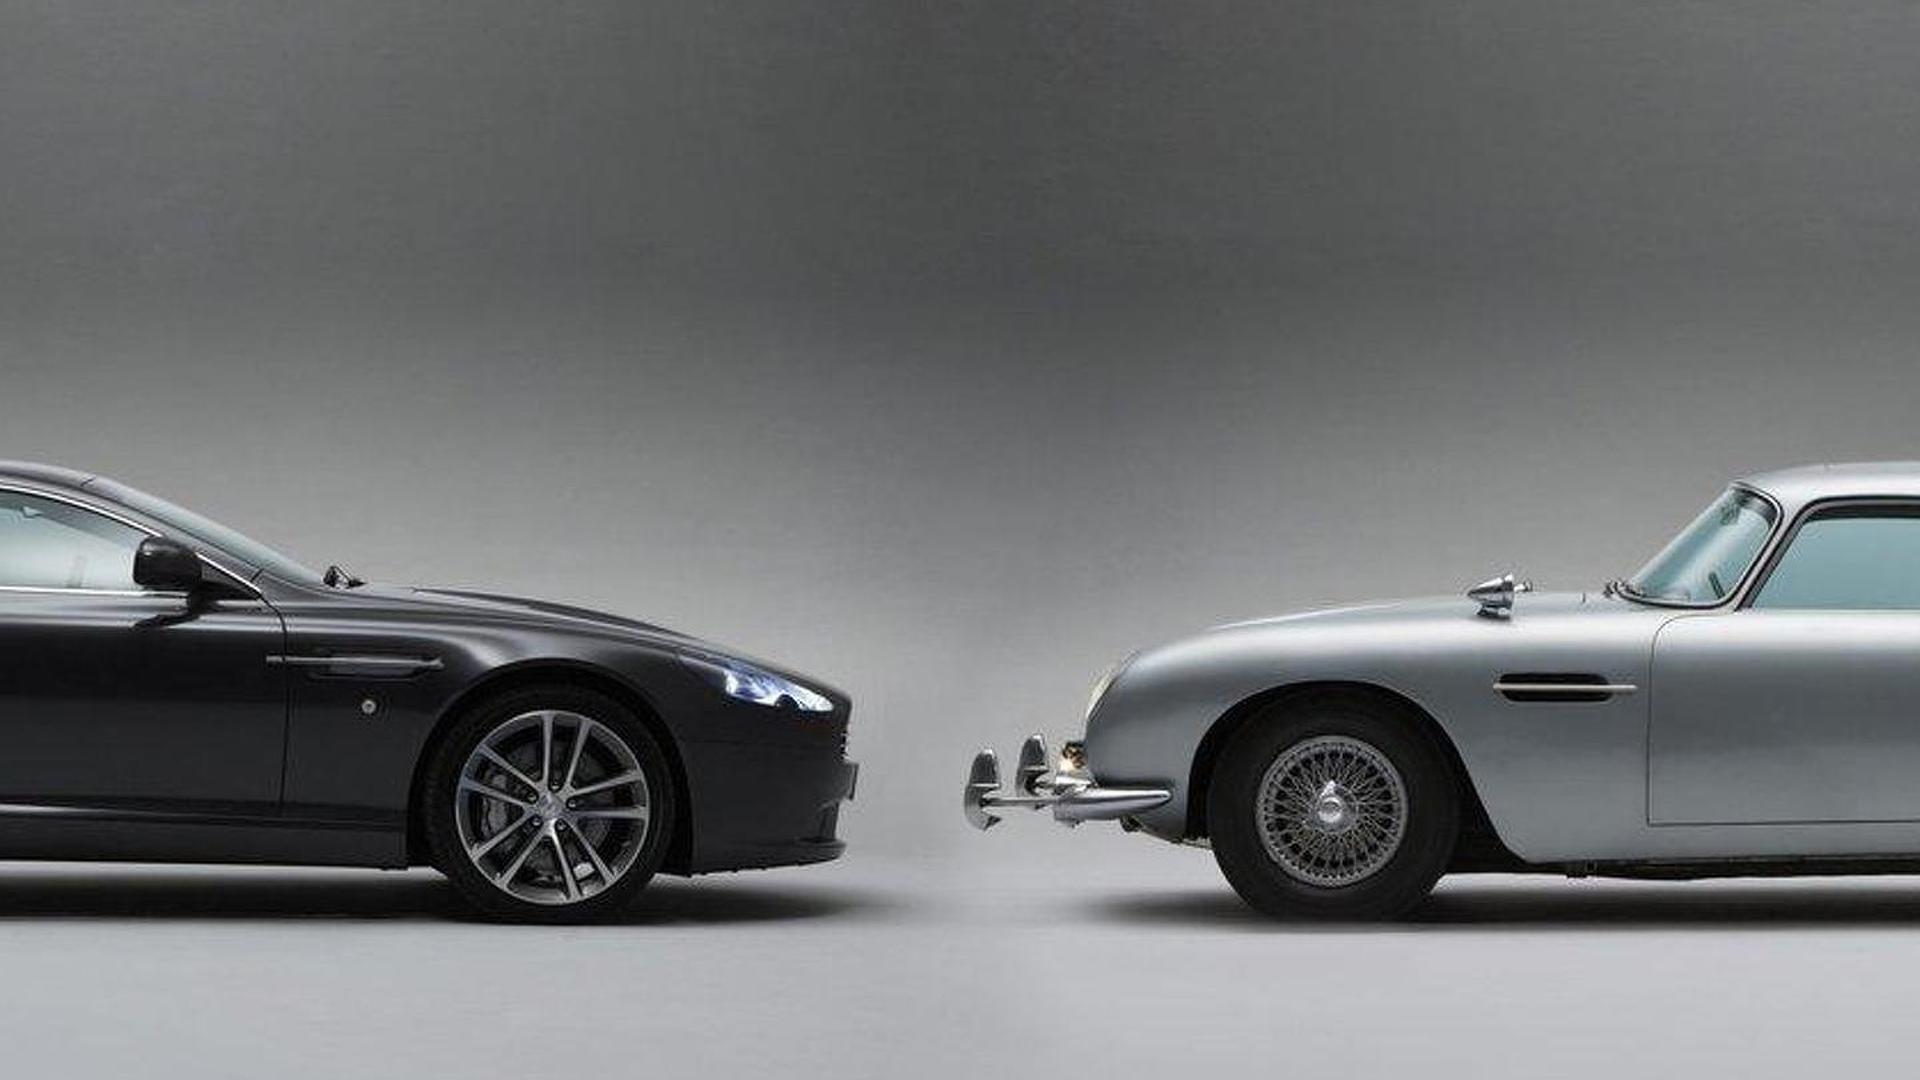 1964 Aston Martin Db5 >> Aston Martin DB5 from Goldfinger sells for $4.6M [videos]